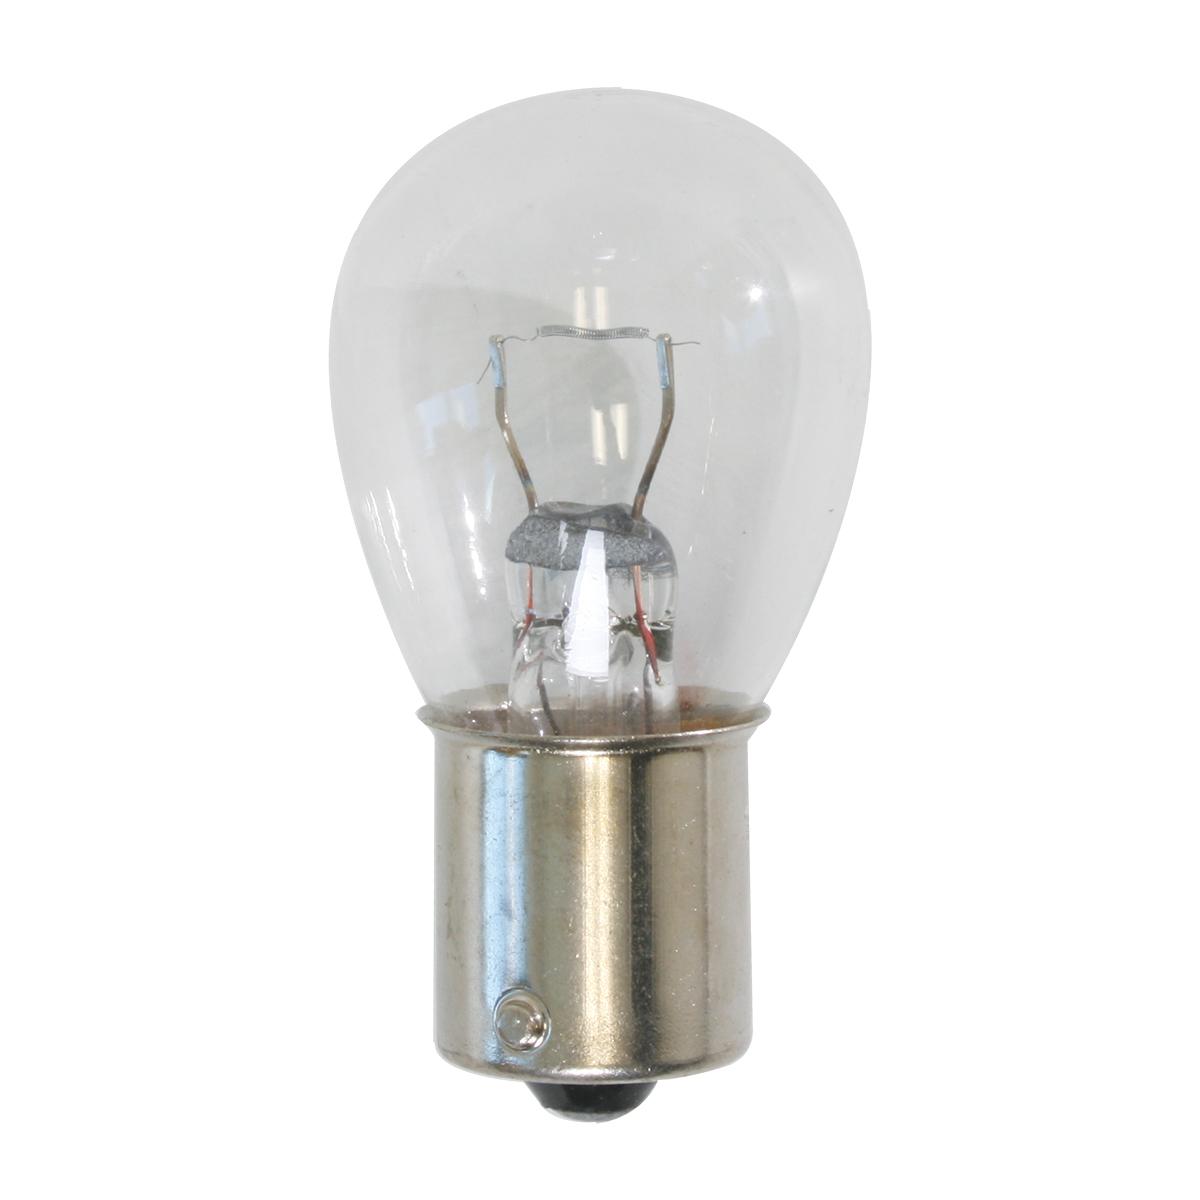 #79182 Miniature Replacement #1141 Light Bulb